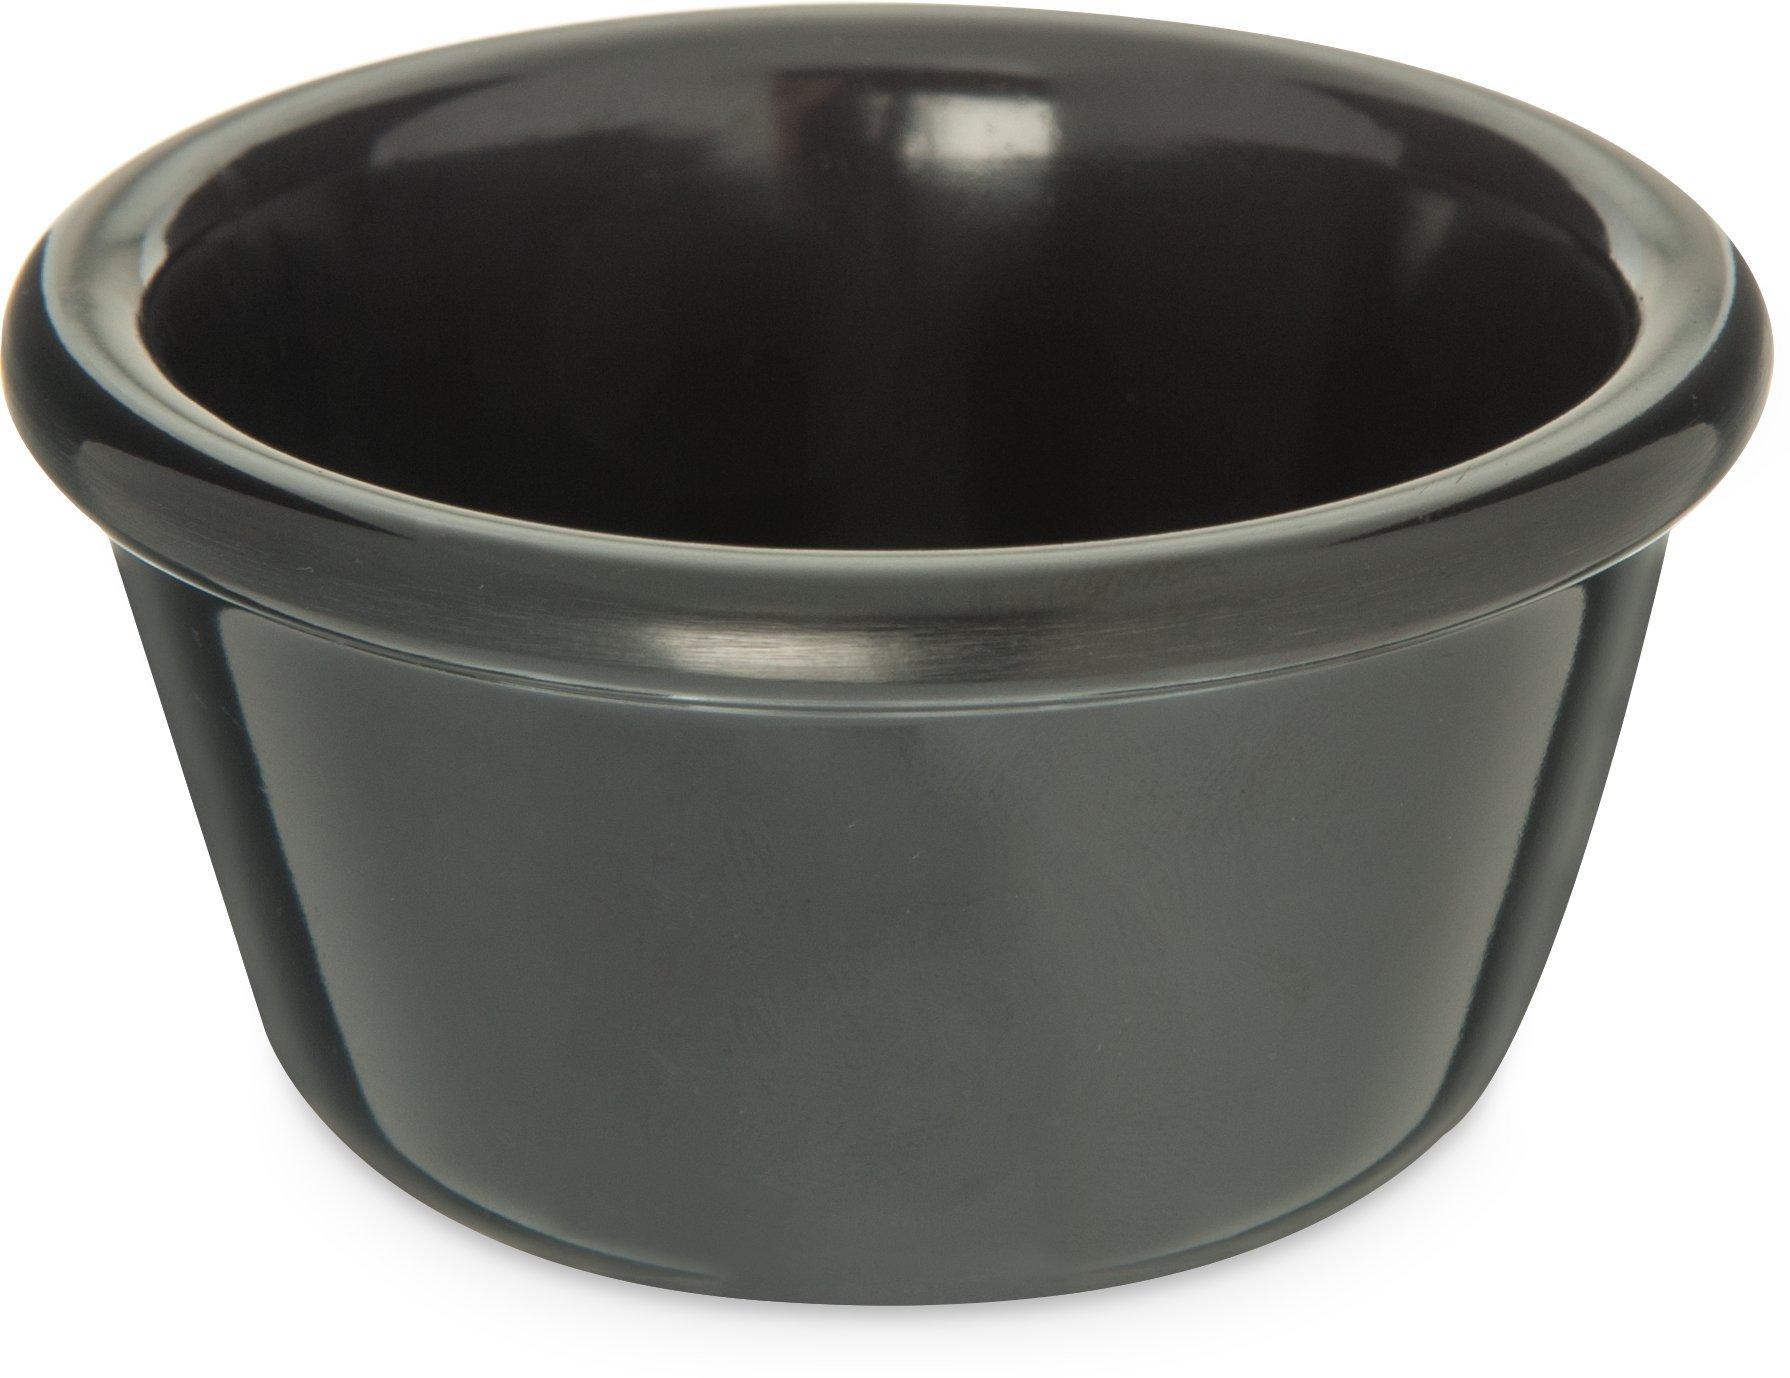 Carlisle S28503 Melamine Smooth Ramekin, 4 oz. Capacity, Black (Case of 48)